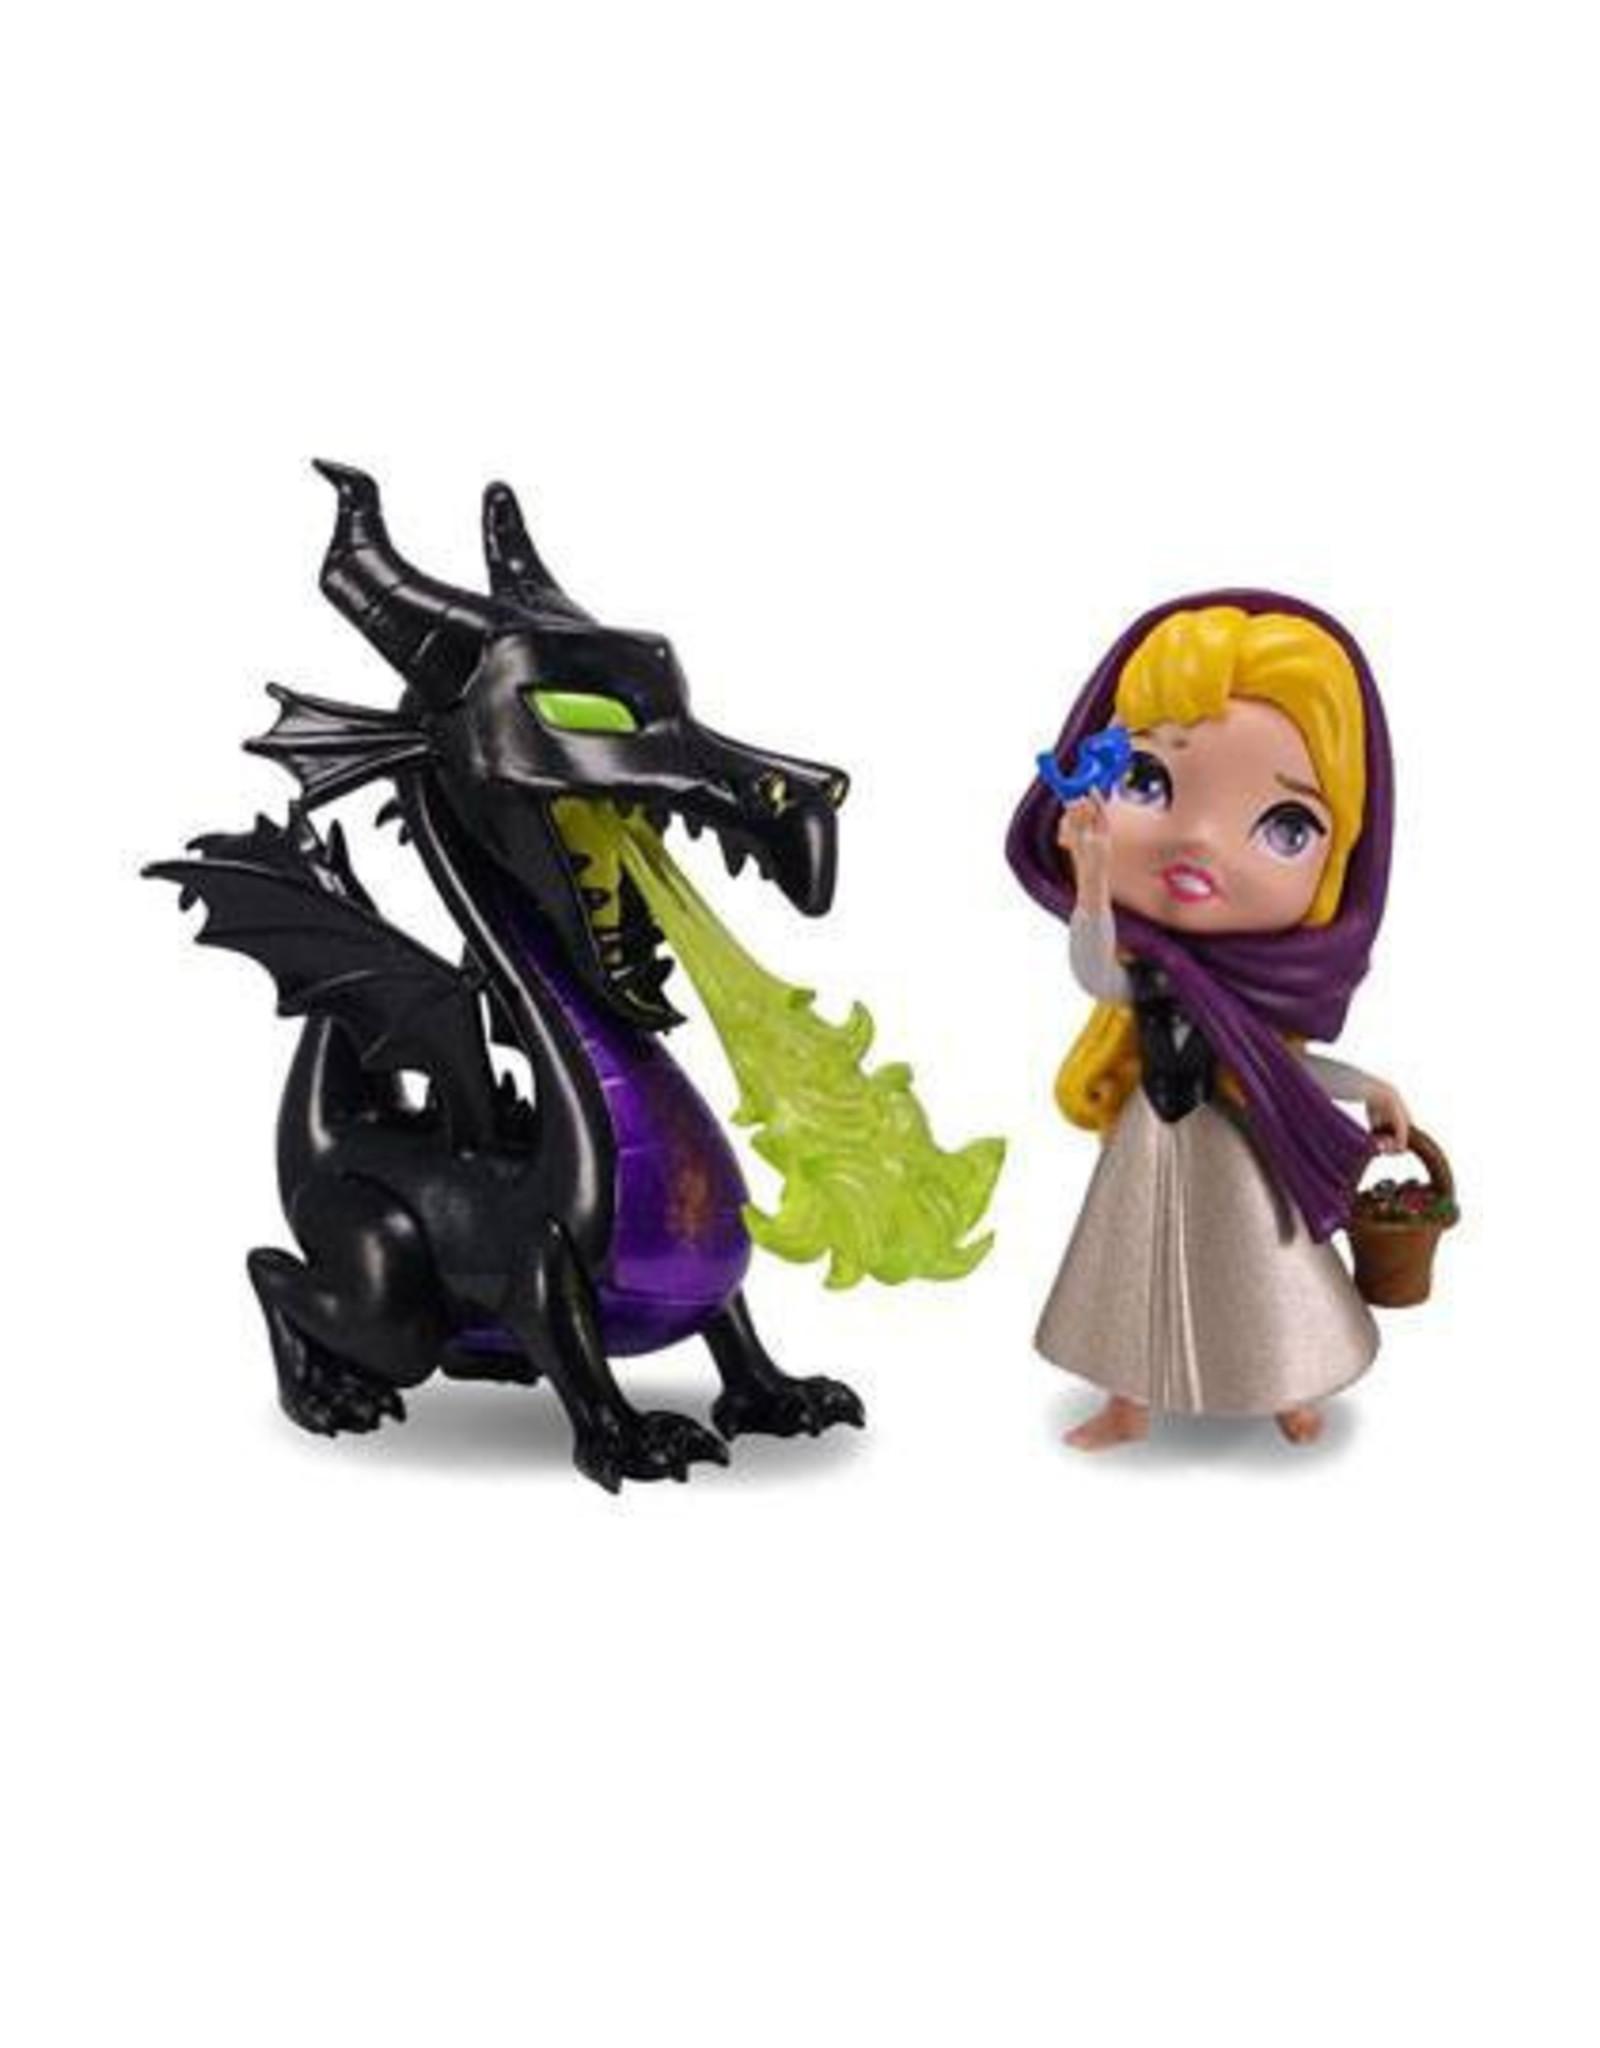 JADA Disney Metalfigs Diecast Mini Figures 2-Pack Maleficent & Briar Rose 10 cm